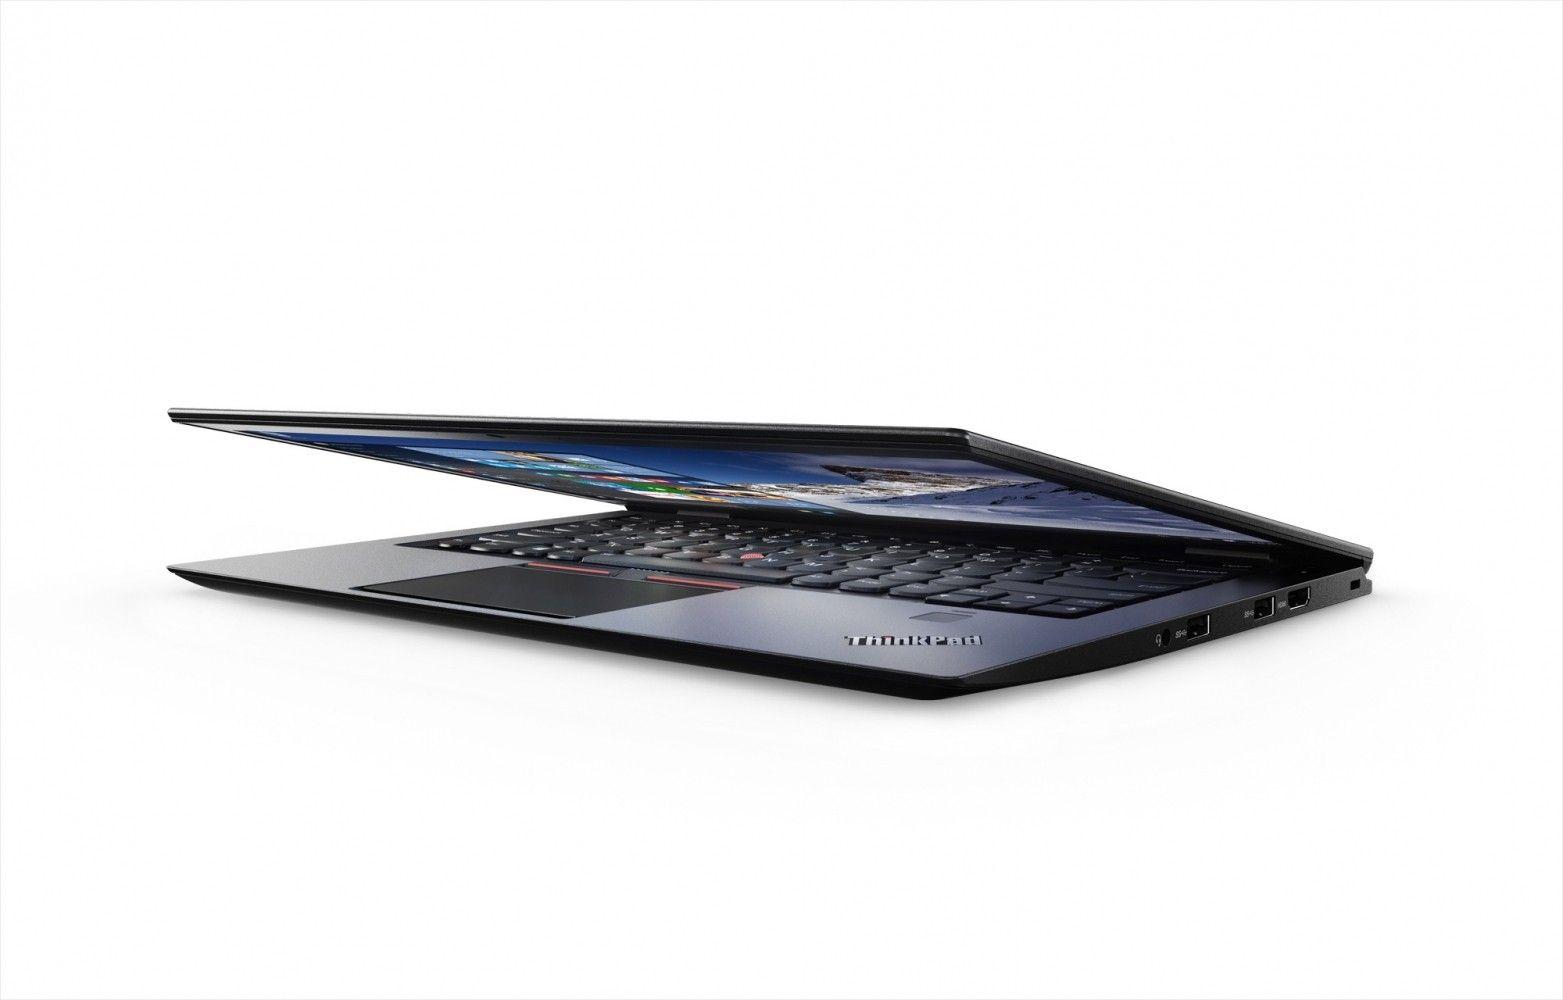 Ноутбук LENOVO ThinkPad X1 Carbon G4 (20FBS02F00) - 4